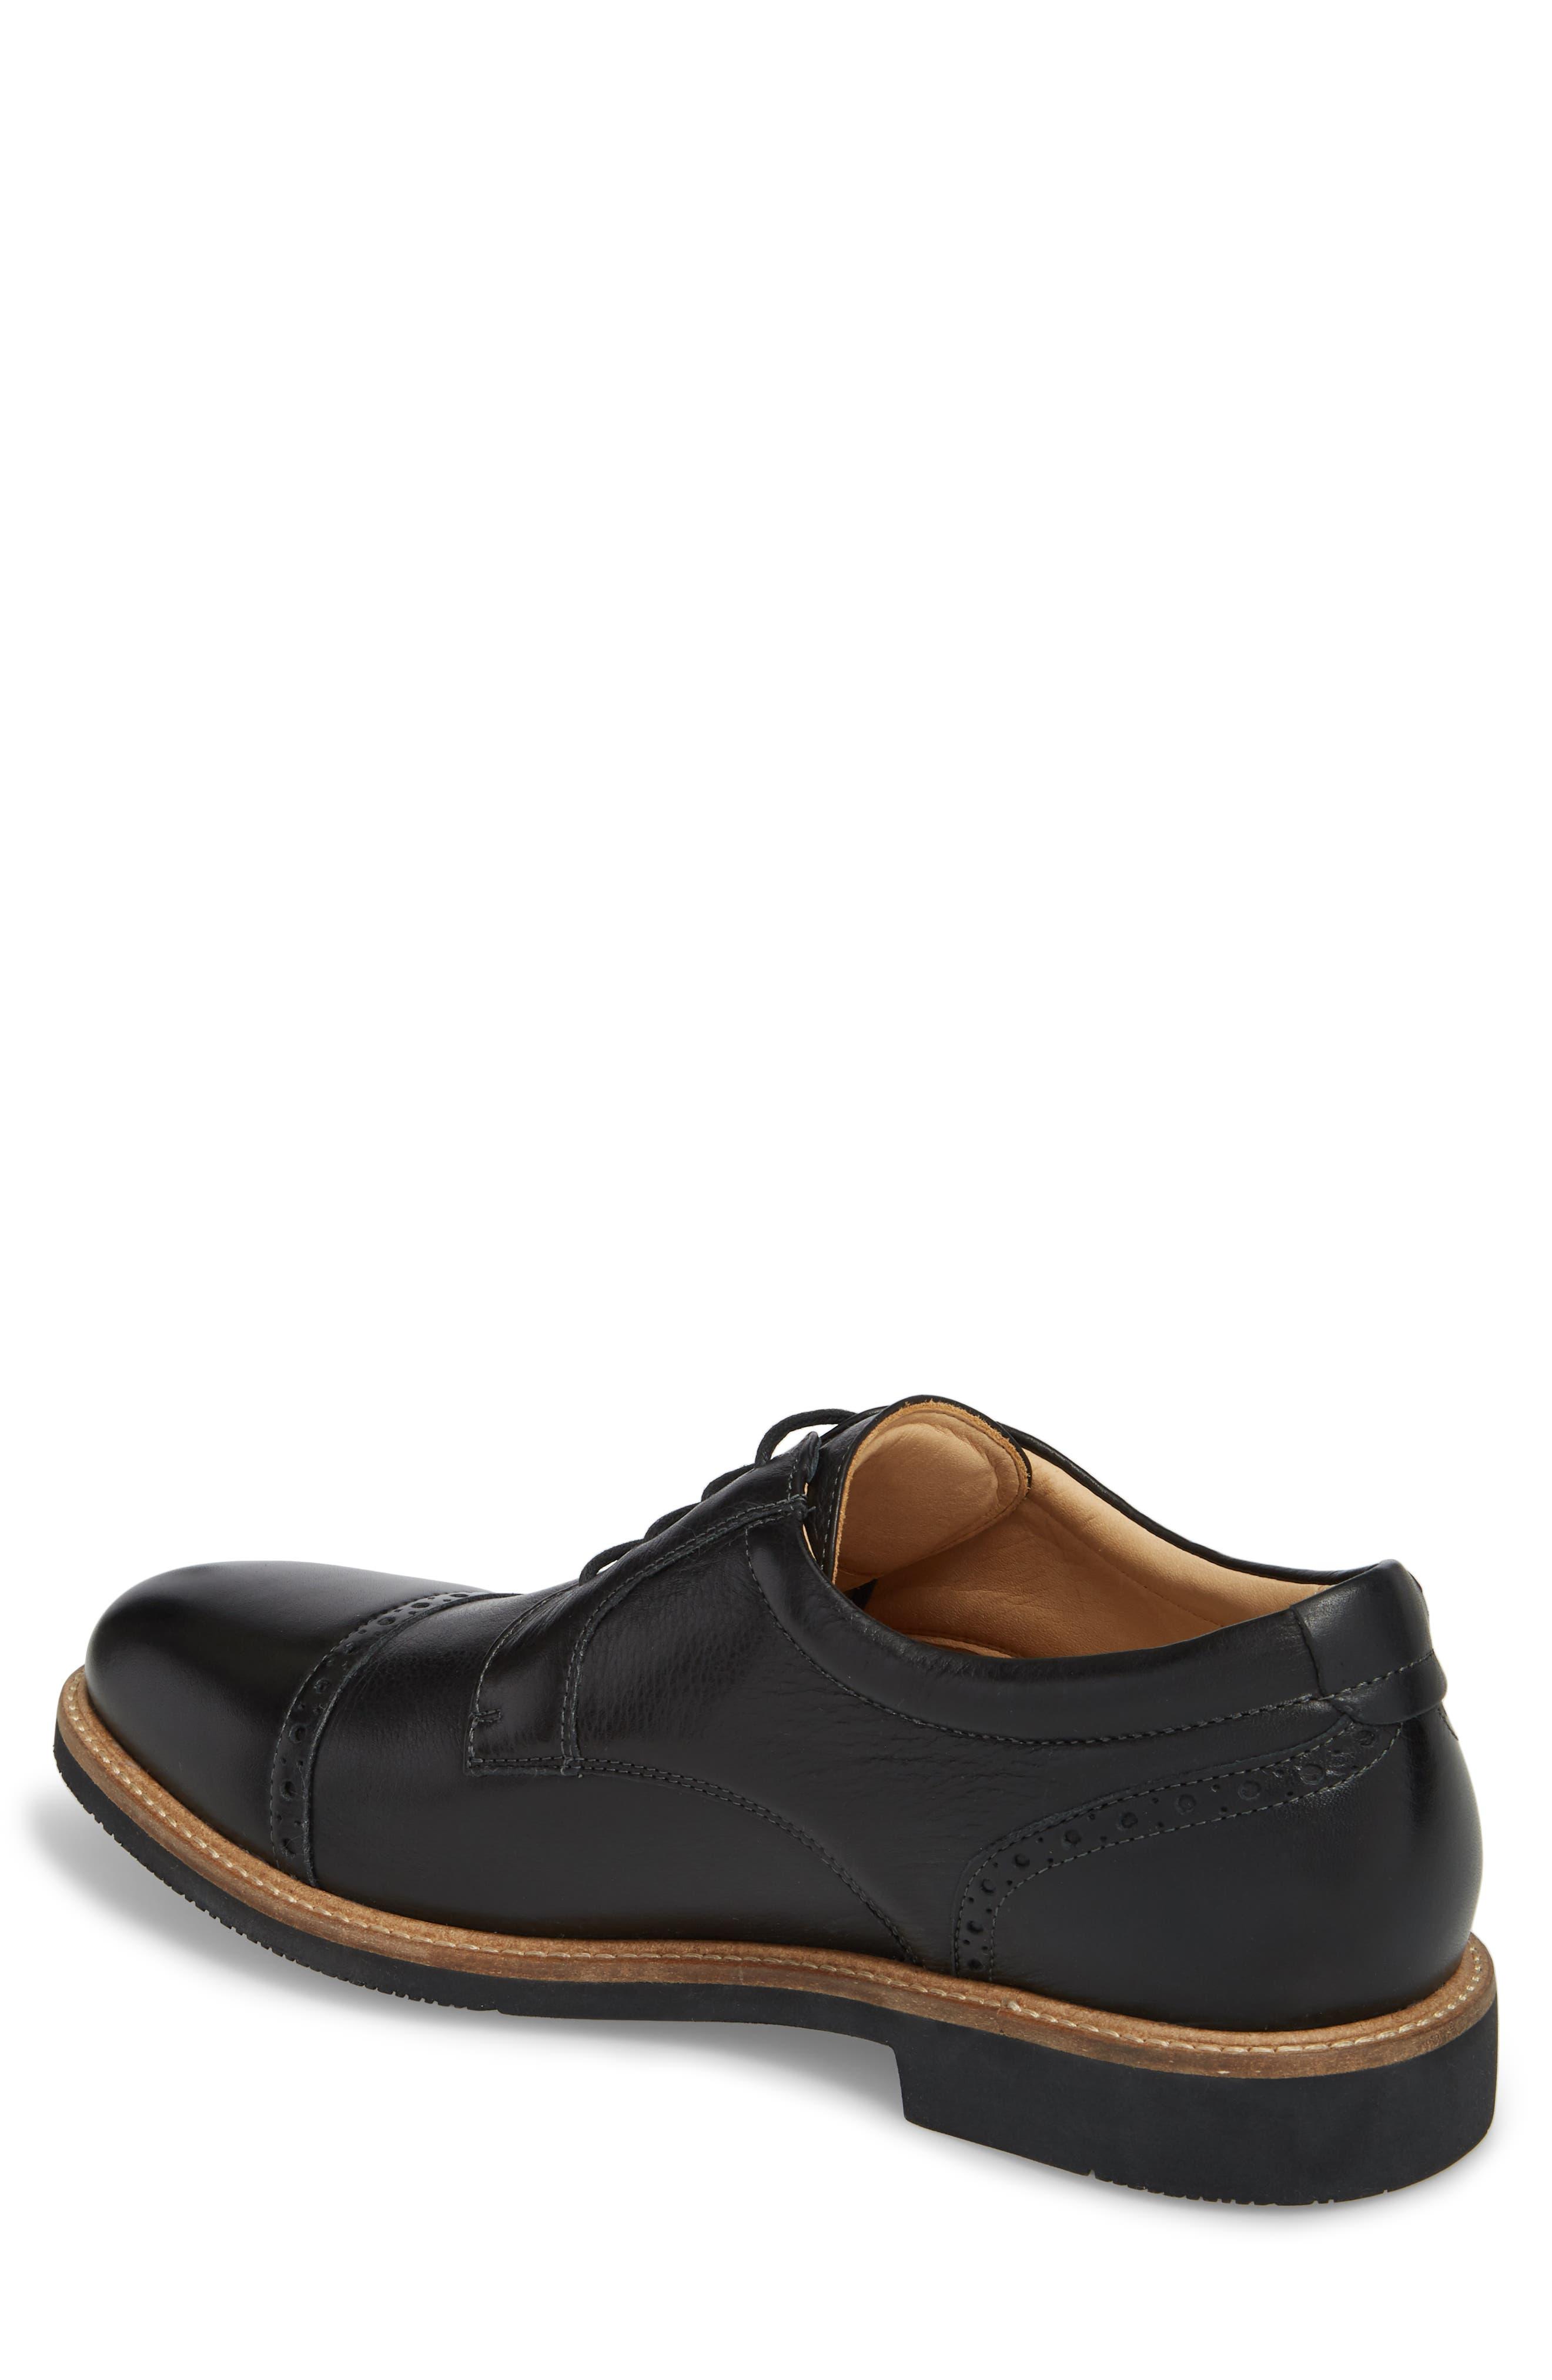 Barlow Cap Toe Derby,                             Alternate thumbnail 2, color,                             Black Leather